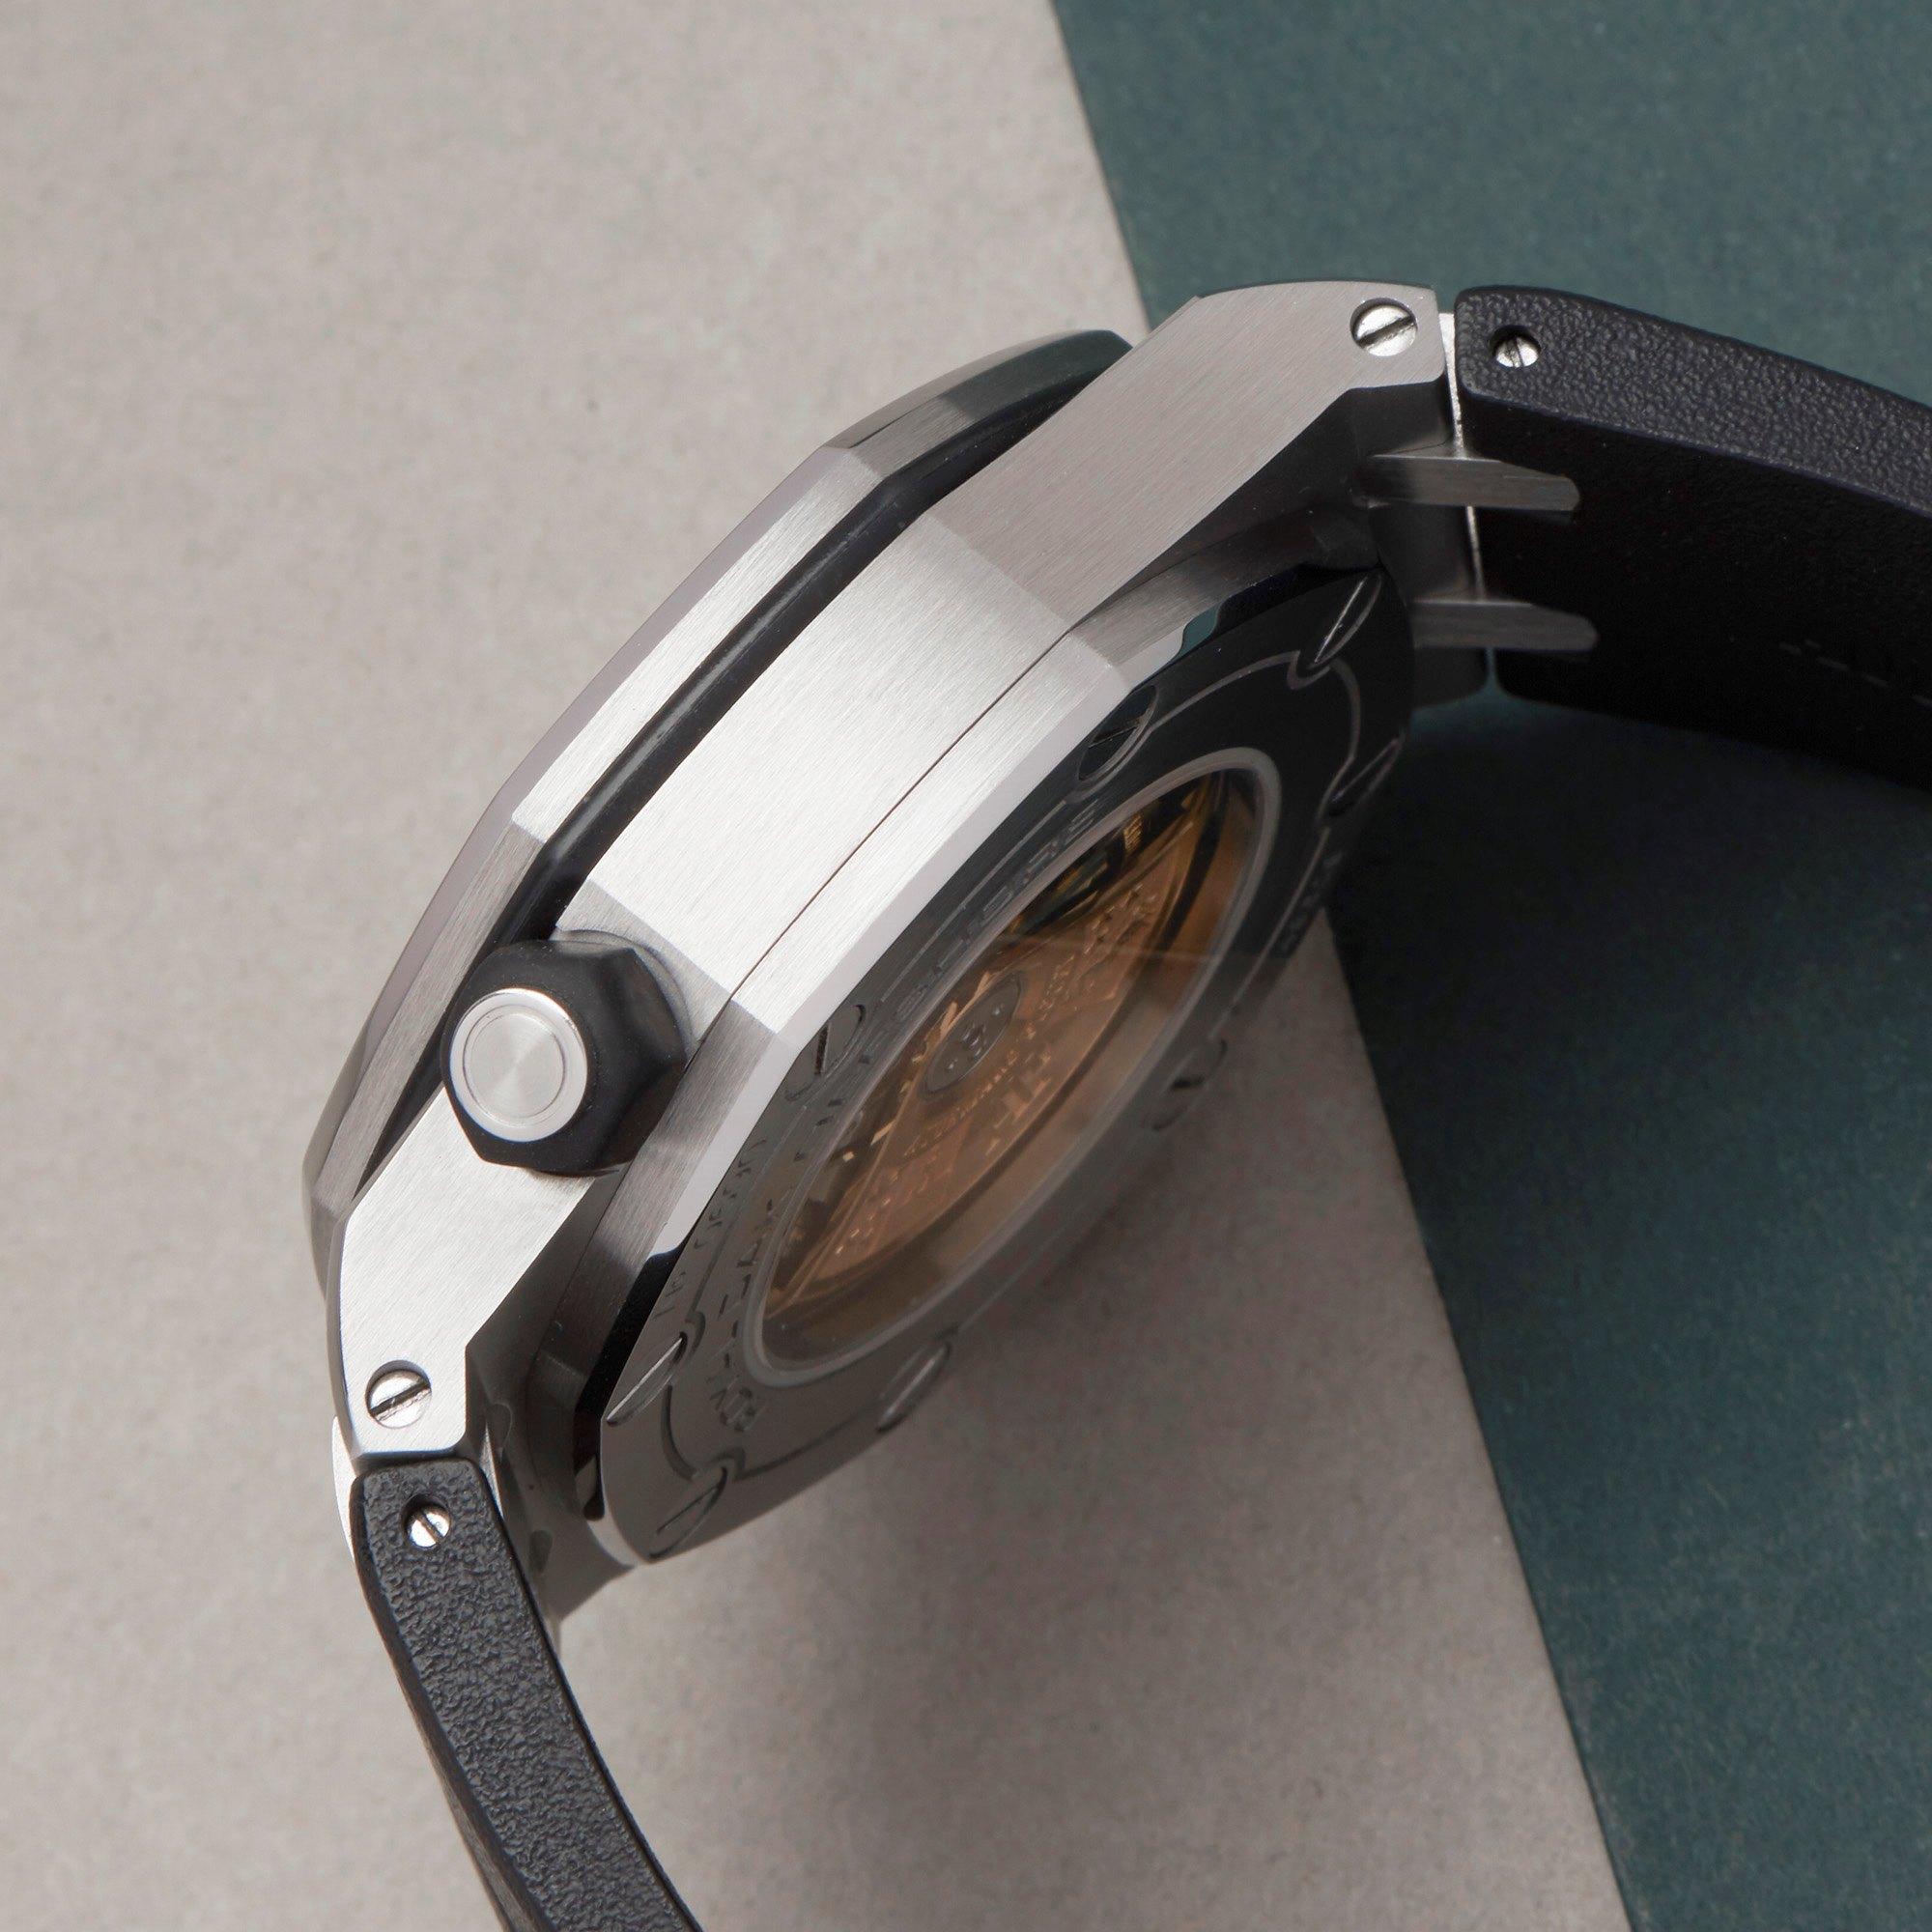 Audemars Piguet Royal Oak Offshore Diver Stainless Steel 15710ST.OO.A002CA.01